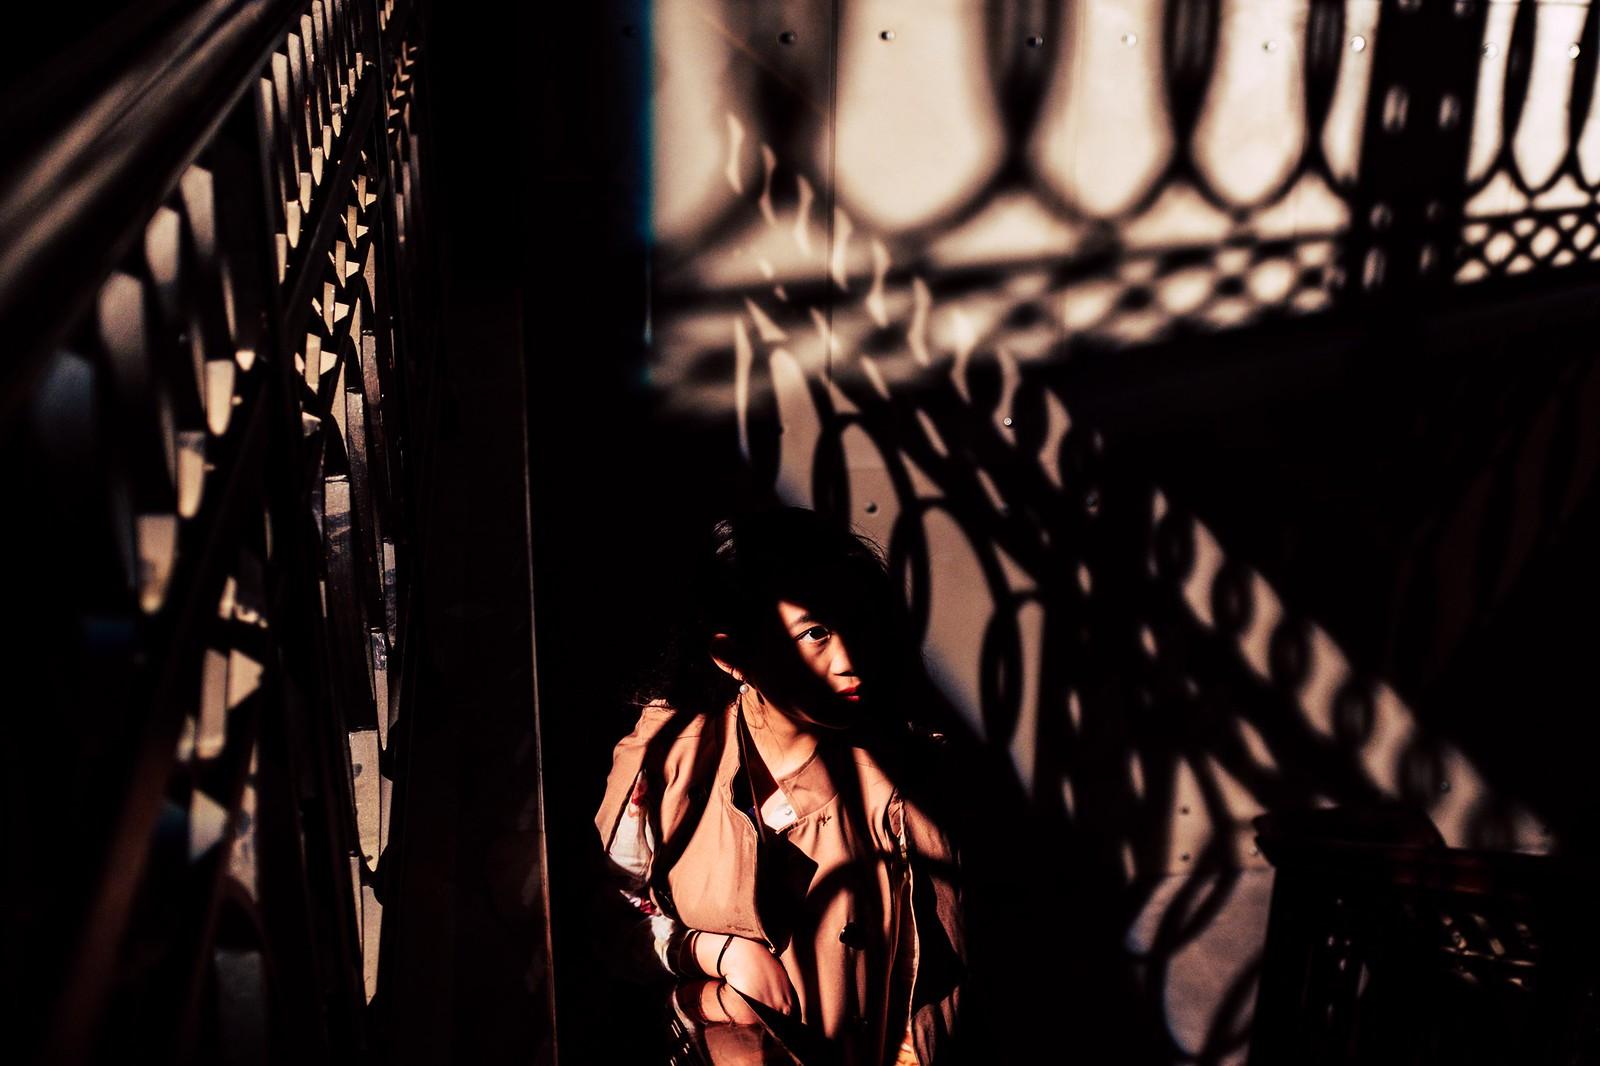 Untitled | by Bojan Nikolic